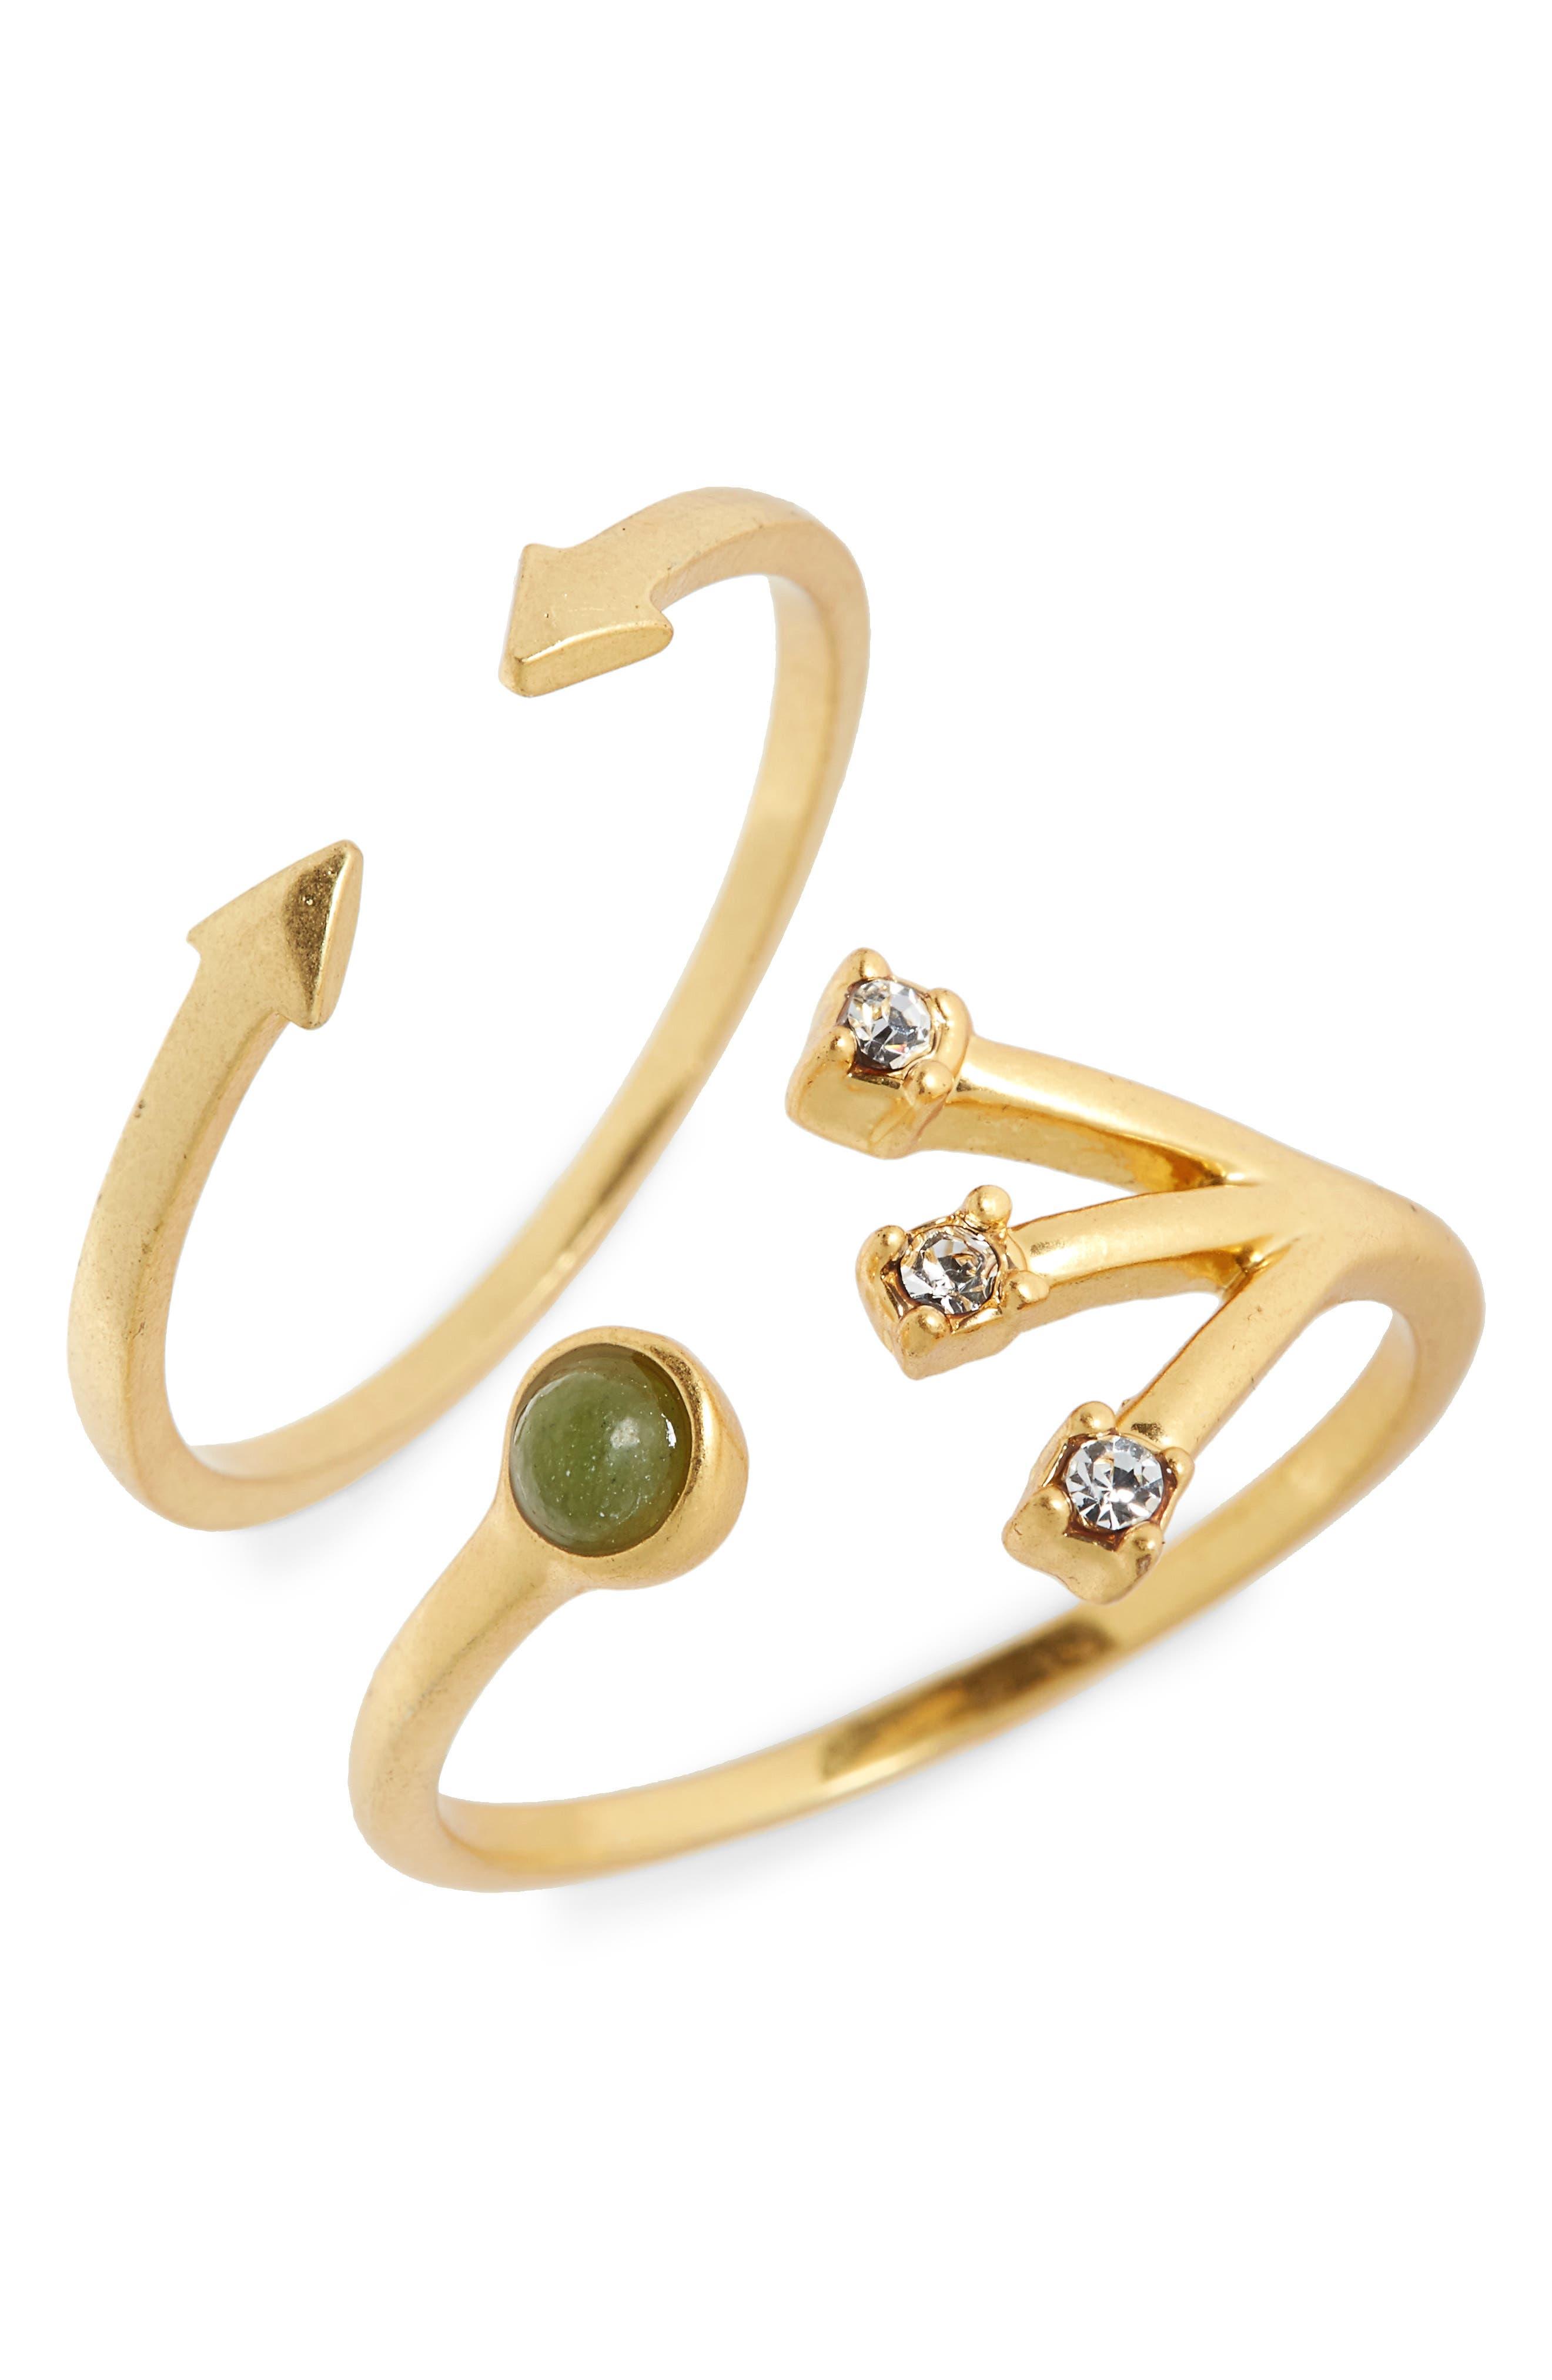 Tiny Jewels Set of 2 Stacking Rings,                             Main thumbnail 1, color,